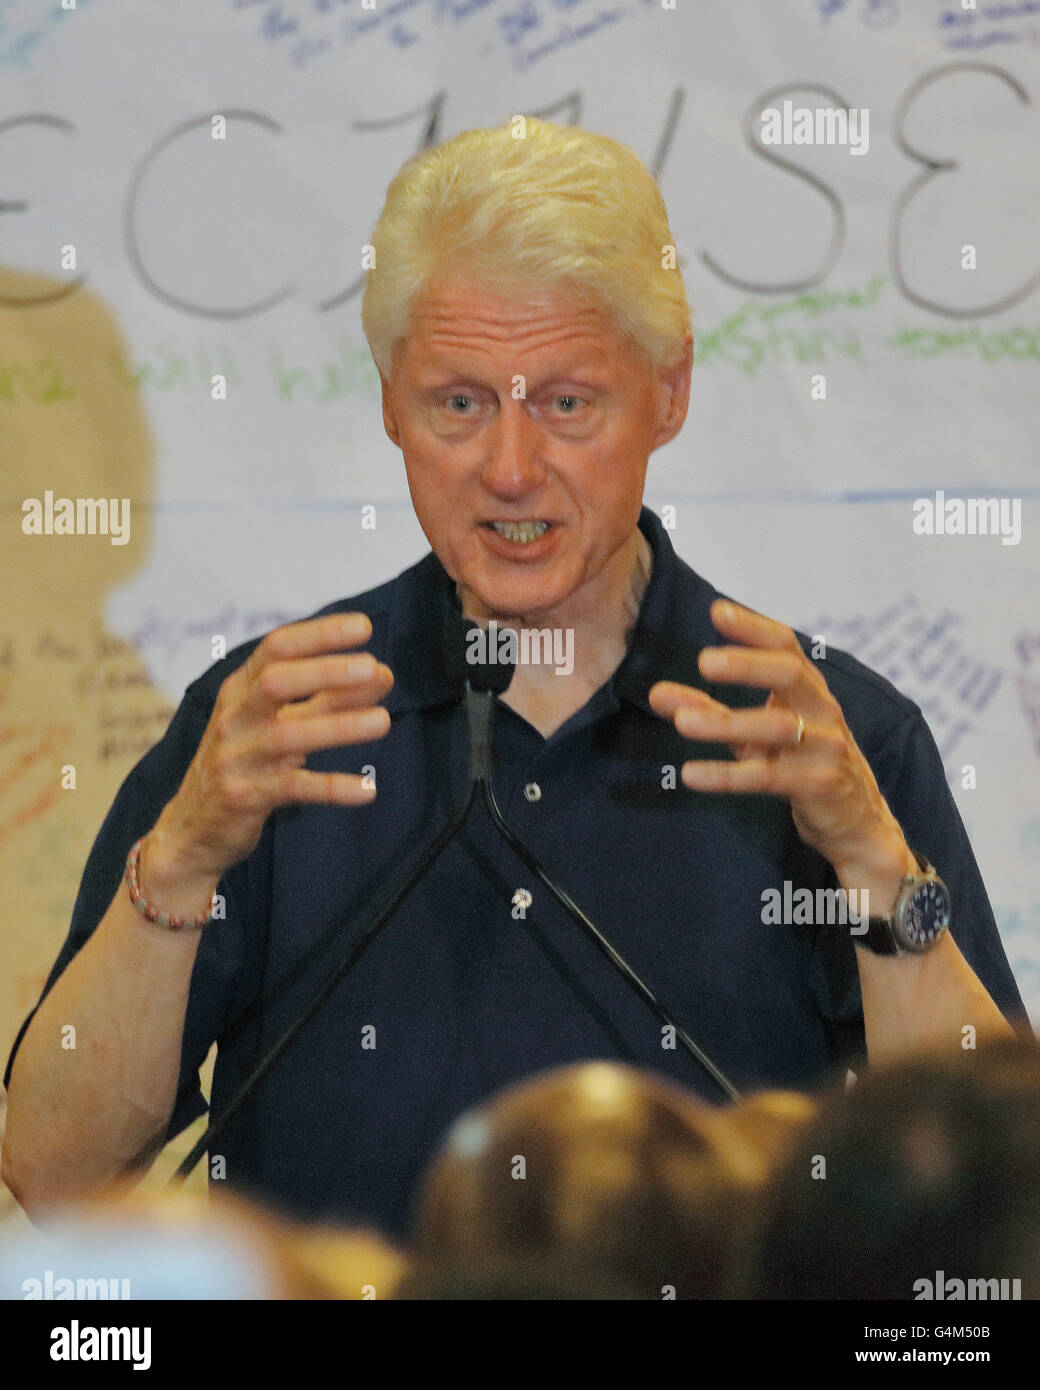 Former President Bill Clinton Speaks at a Hillary Clinton Rally, Woodland Hills, CA Stock Photo